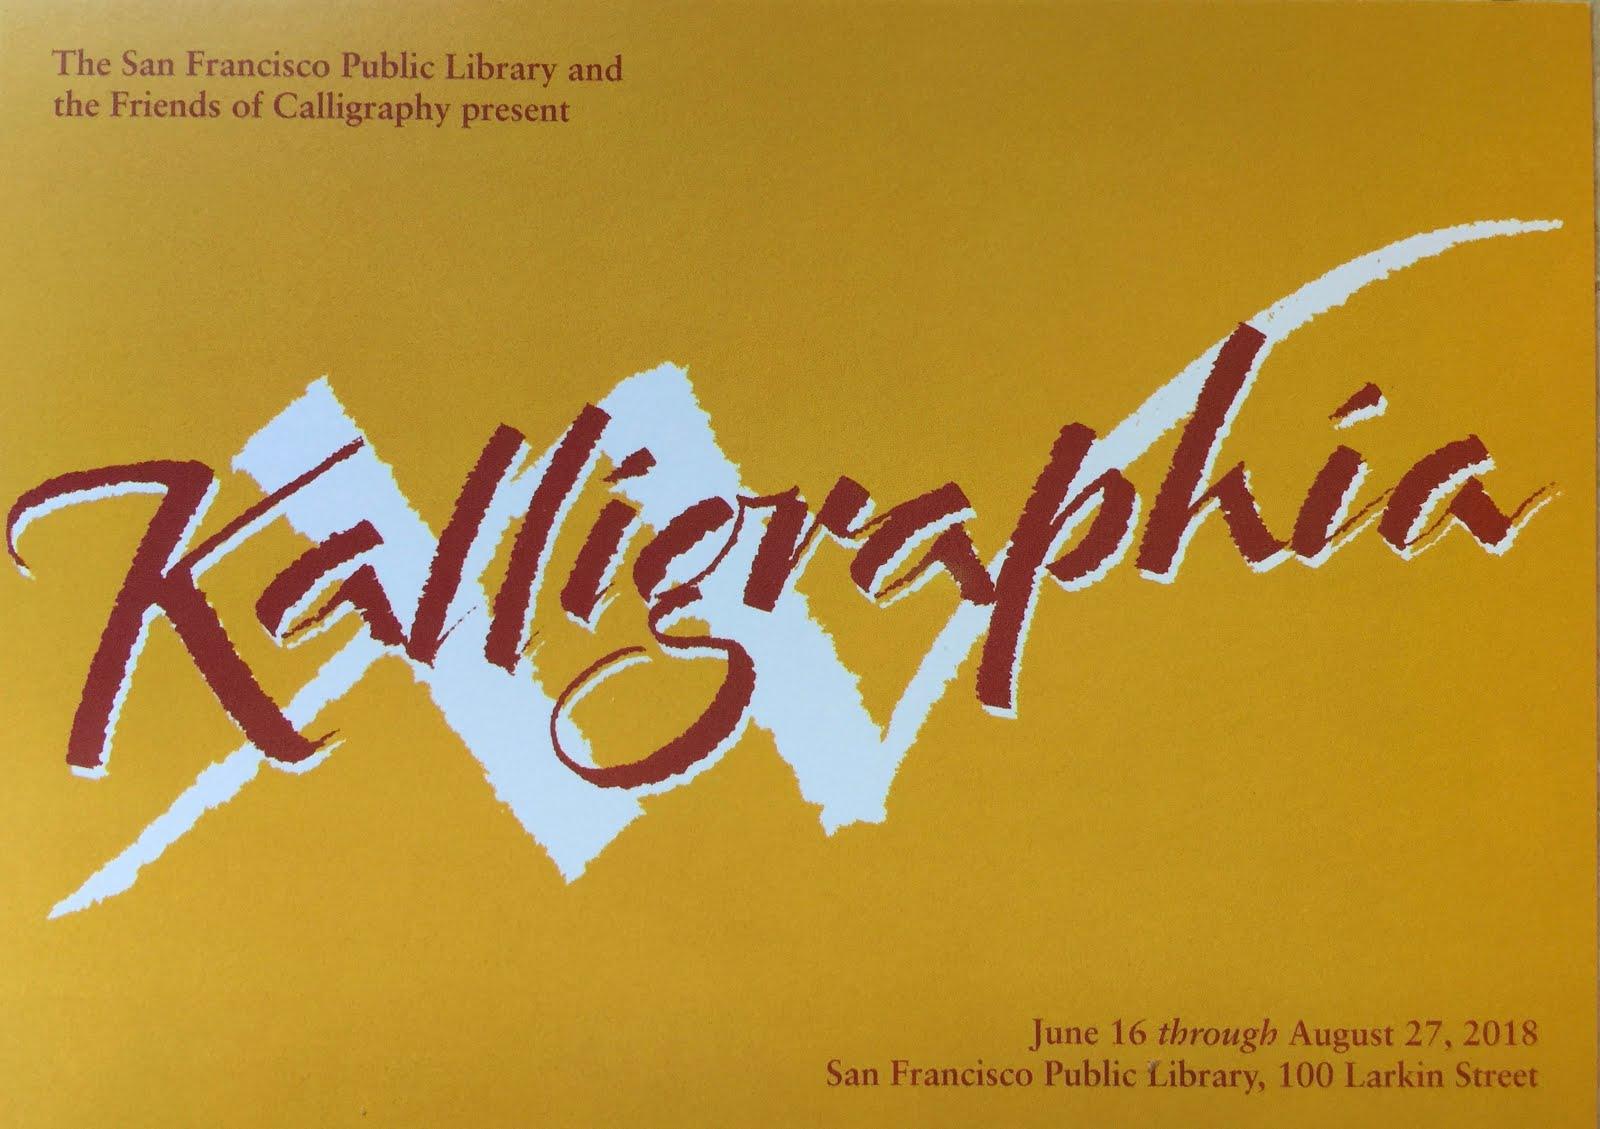 Kalligraphica